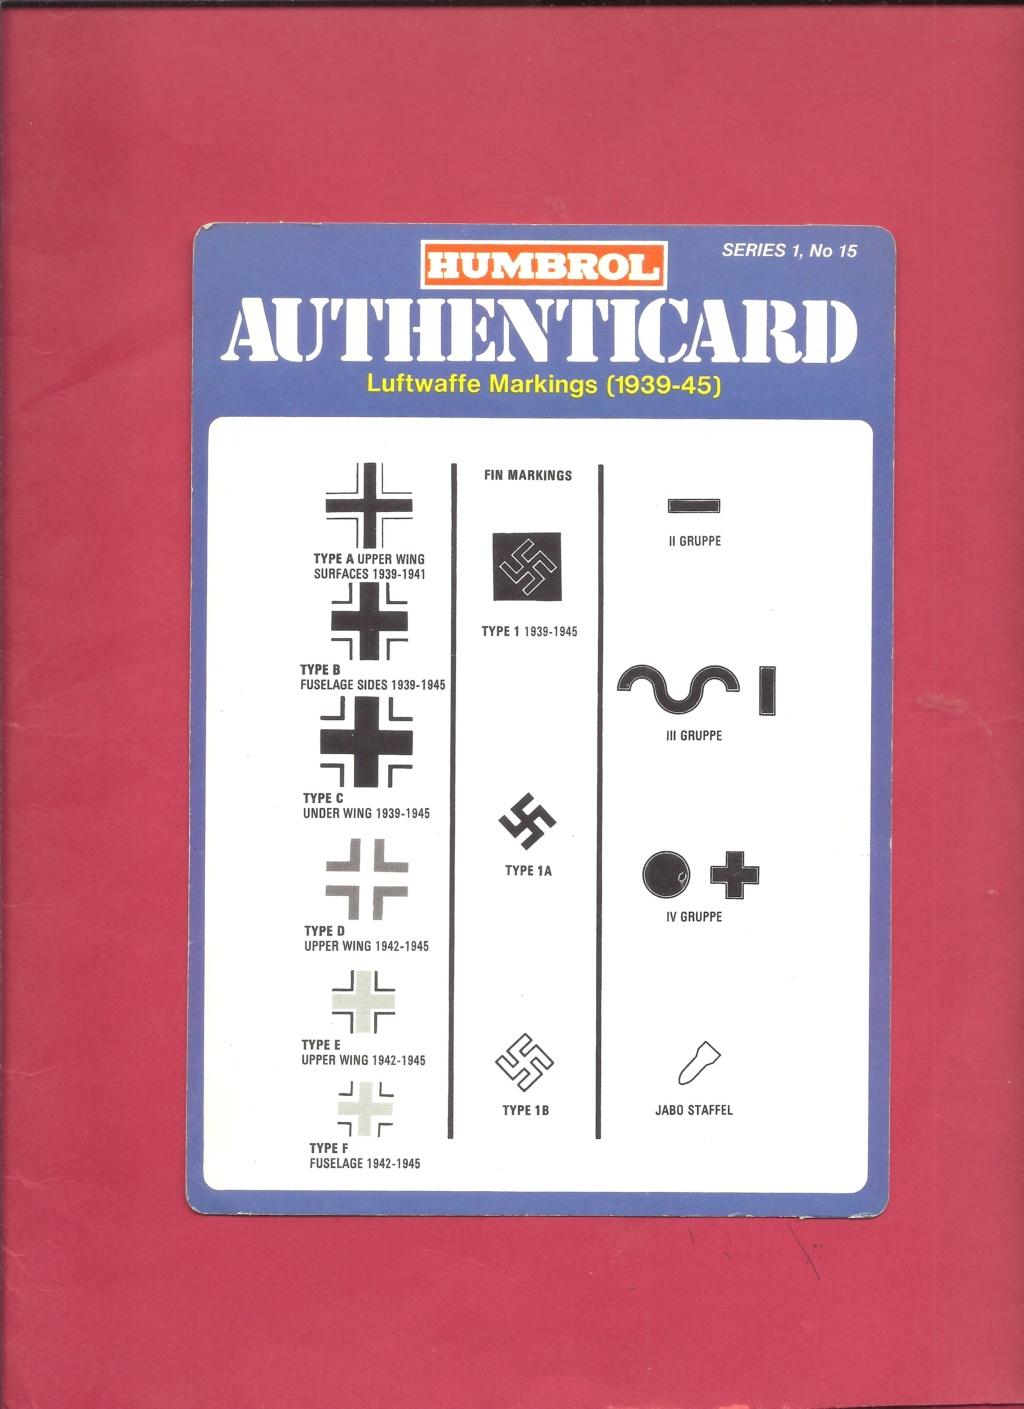 [HUMBROL 1975] AUTHENTICARD Series 1 n°10 LUFTWAFFE markings (1939 - 1945)  Humbro19